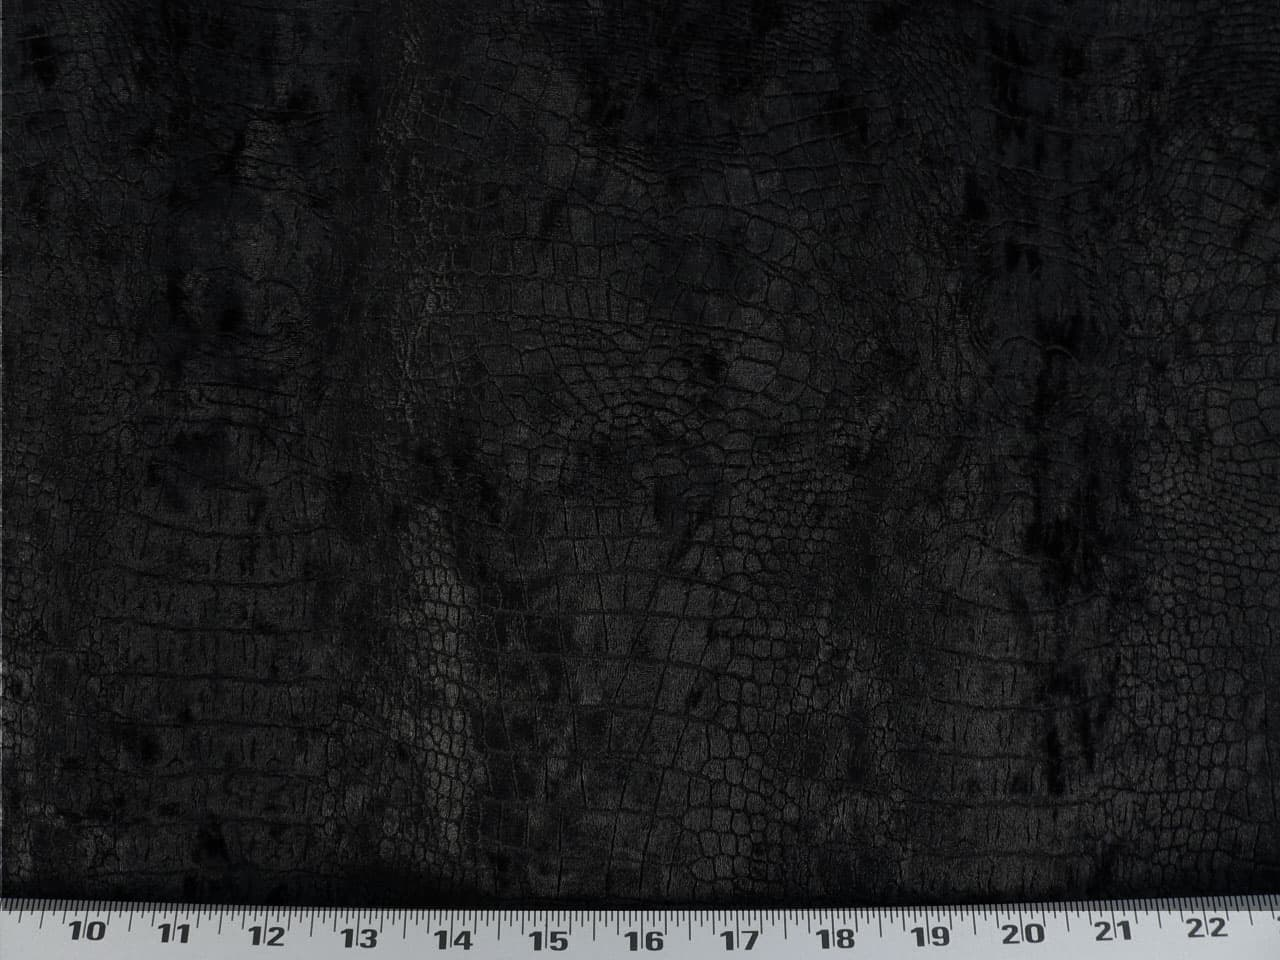 Crocodile Velvet Black Fabric 7 8 Yd Pc Best Fabric Store